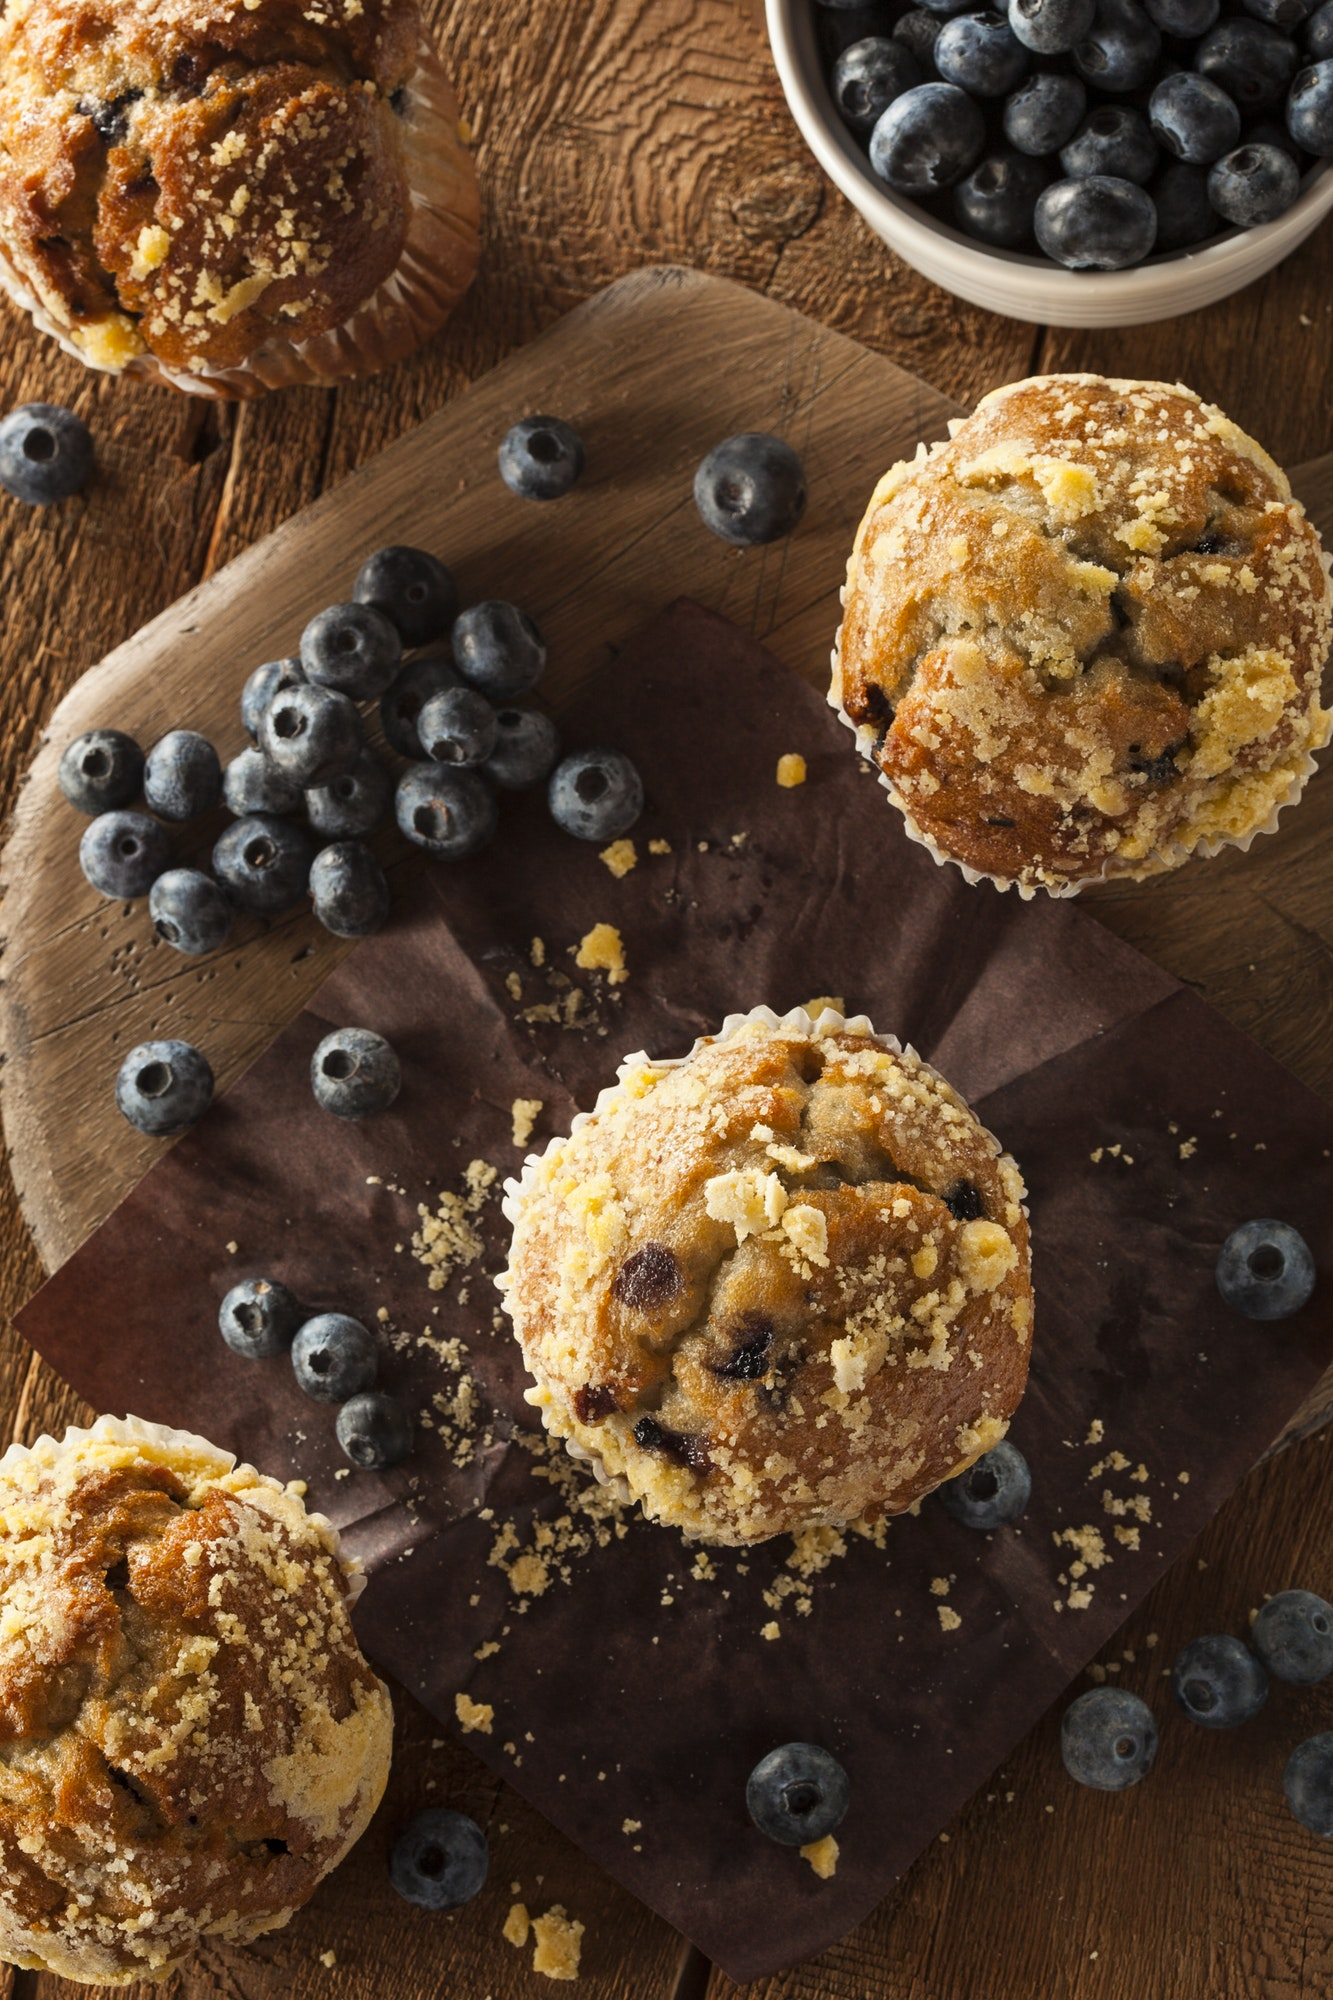 Homemade Blueberry Muffins for Breakfast